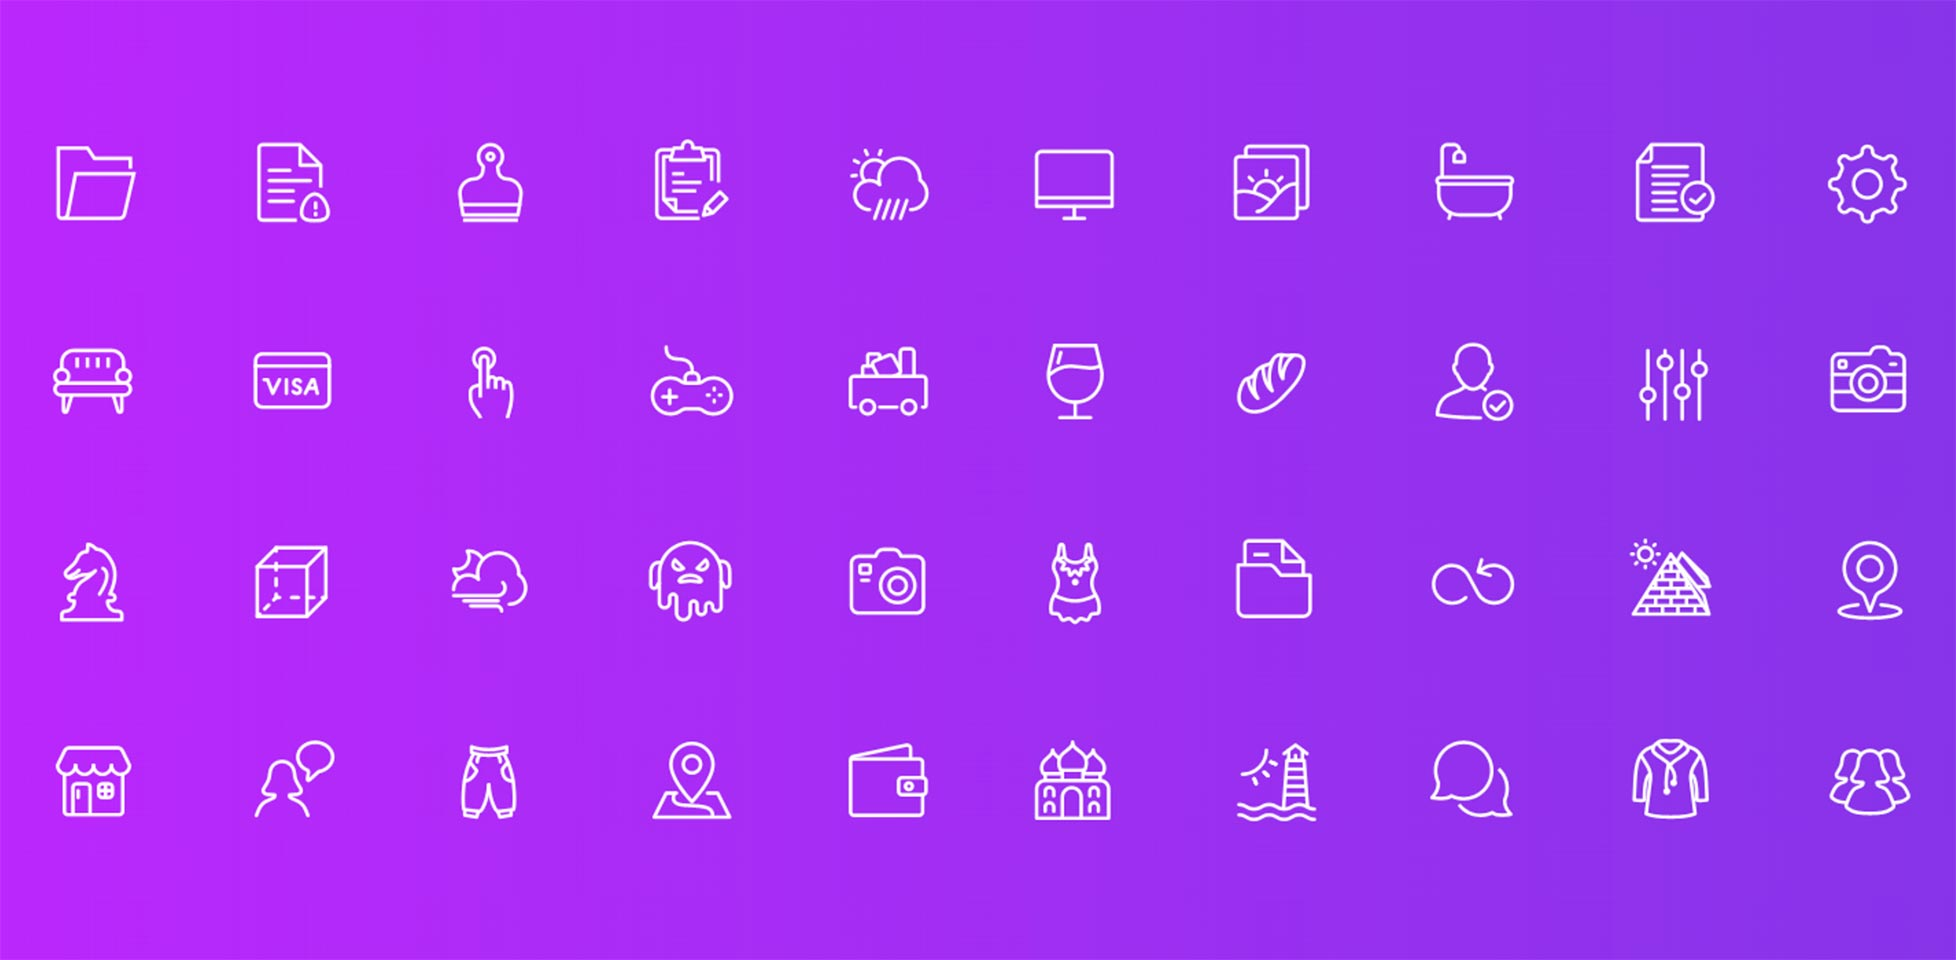 50+ Fresh Resources for Designers, November 2015